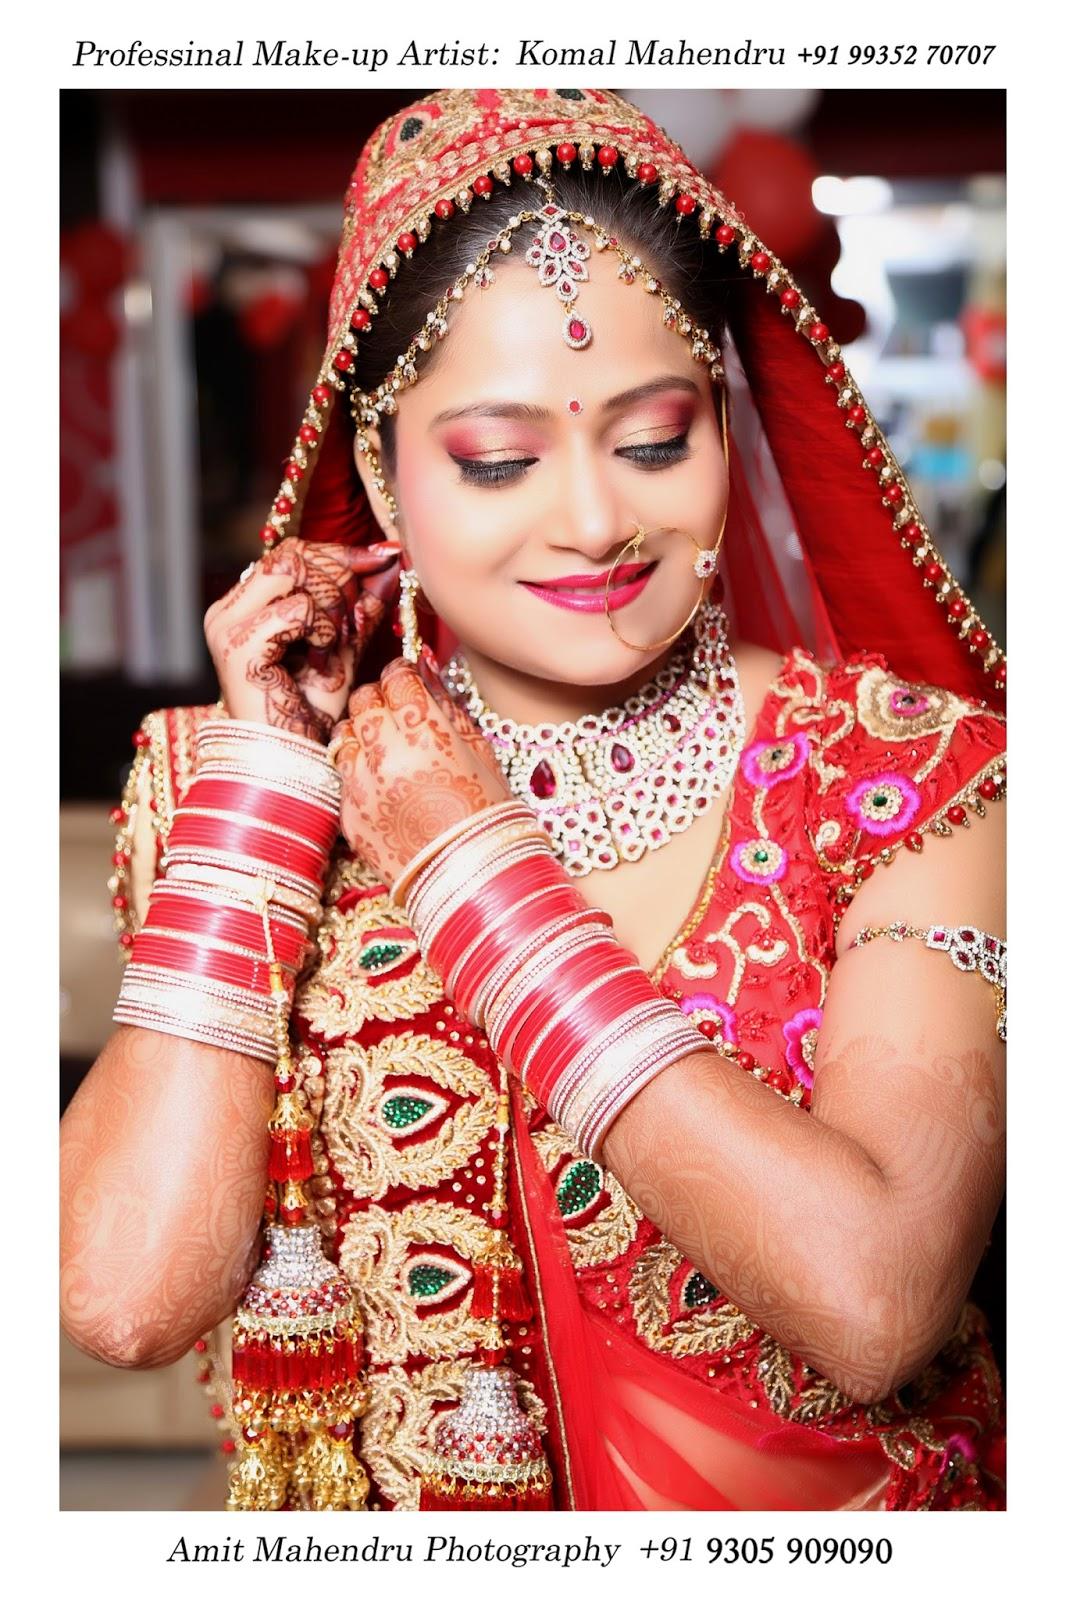 Komal mahendru s professional makeup lucknow india bridal makeup - Bridal Makeup Artist In Lucknow By Komal Mahendru